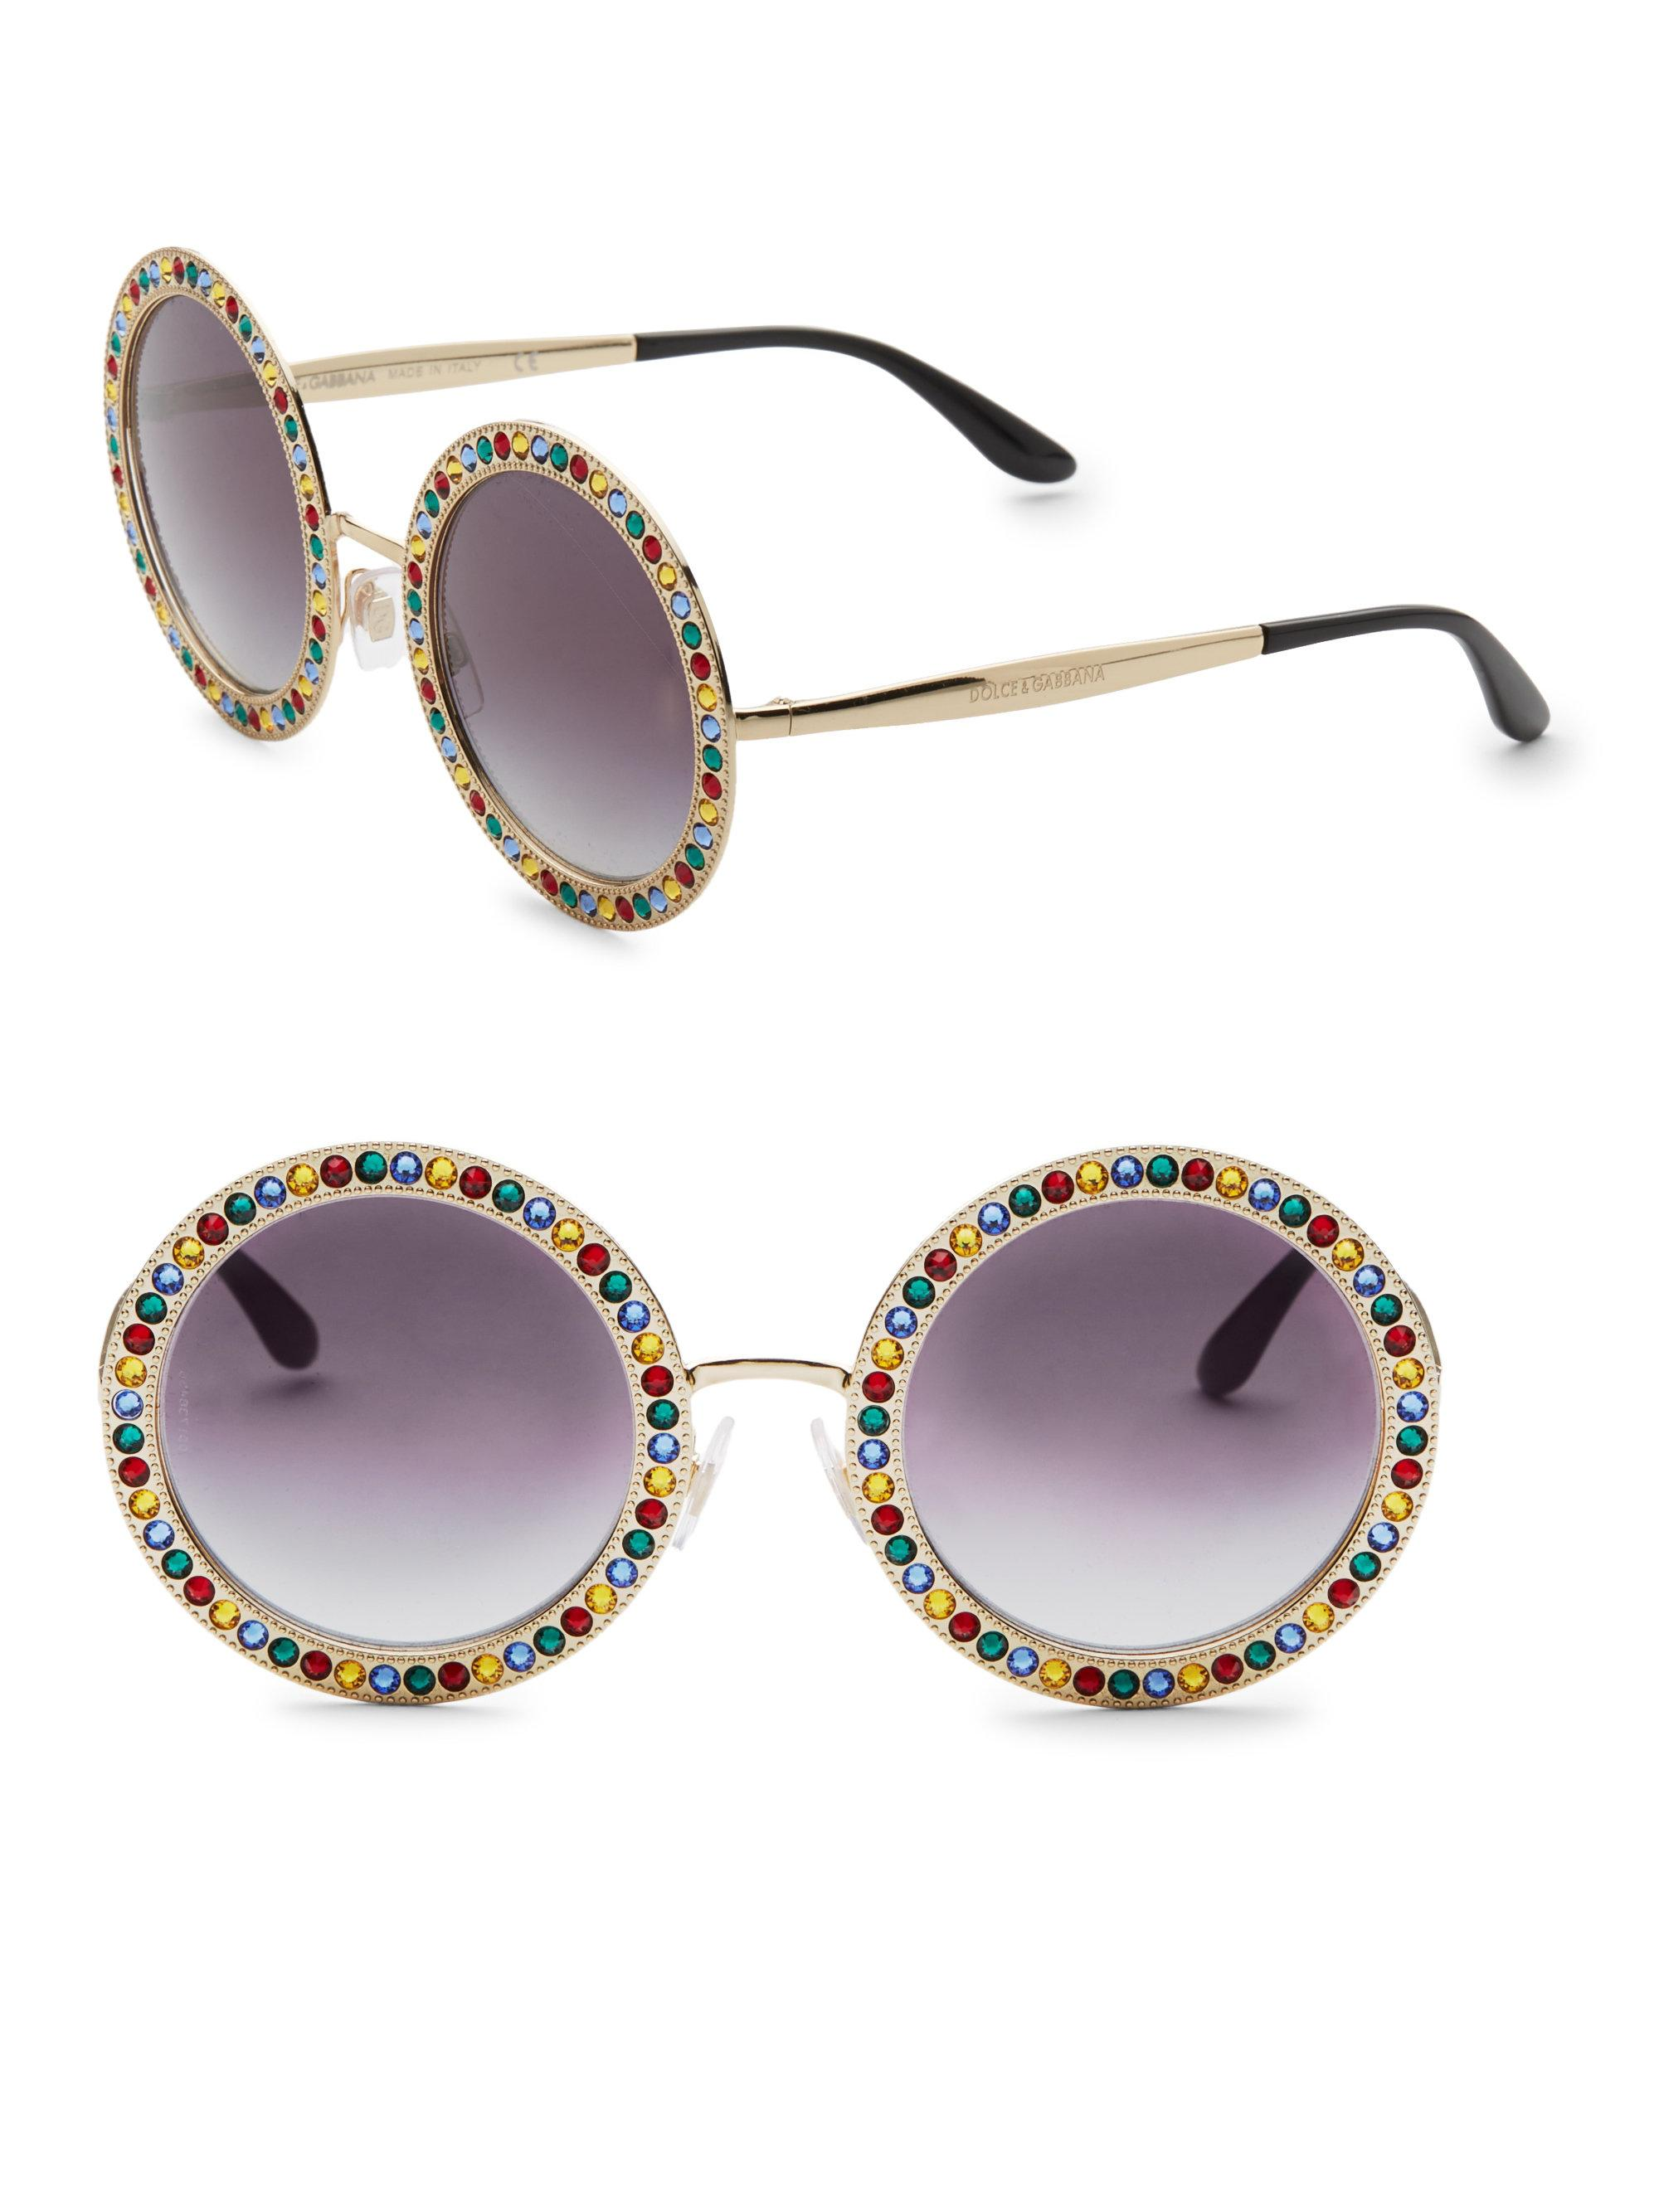 8c65fd8e79e Lyst - Dolce   Gabbana 51mm Crystal-trim Round Sunglasses in Pink